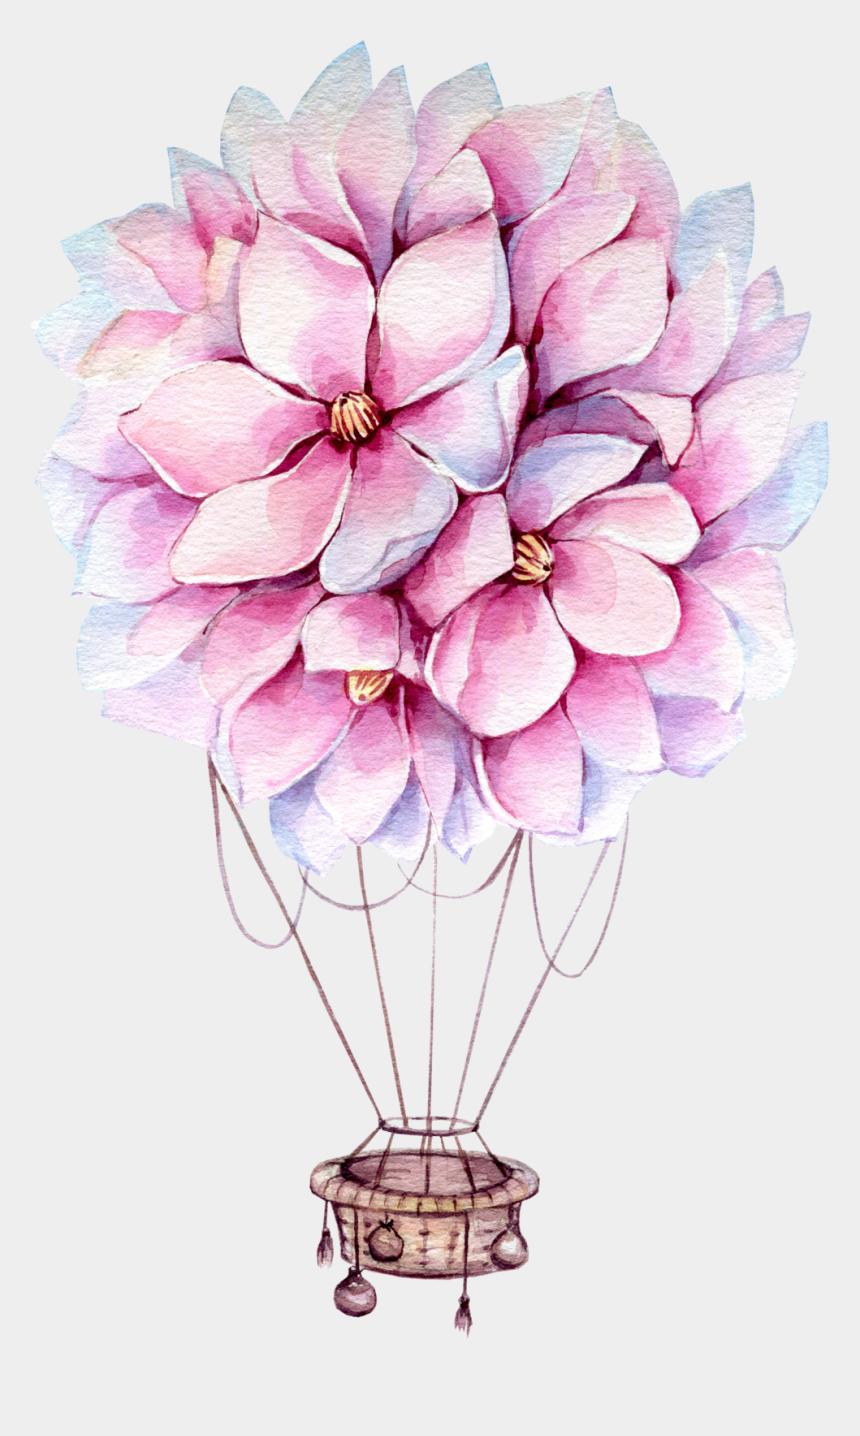 hot air balloons clipart, Cartoons - Фото, Автор ✿lili@ ✿ На Яндекс - Hot Air Balloon Clipart Watercolor